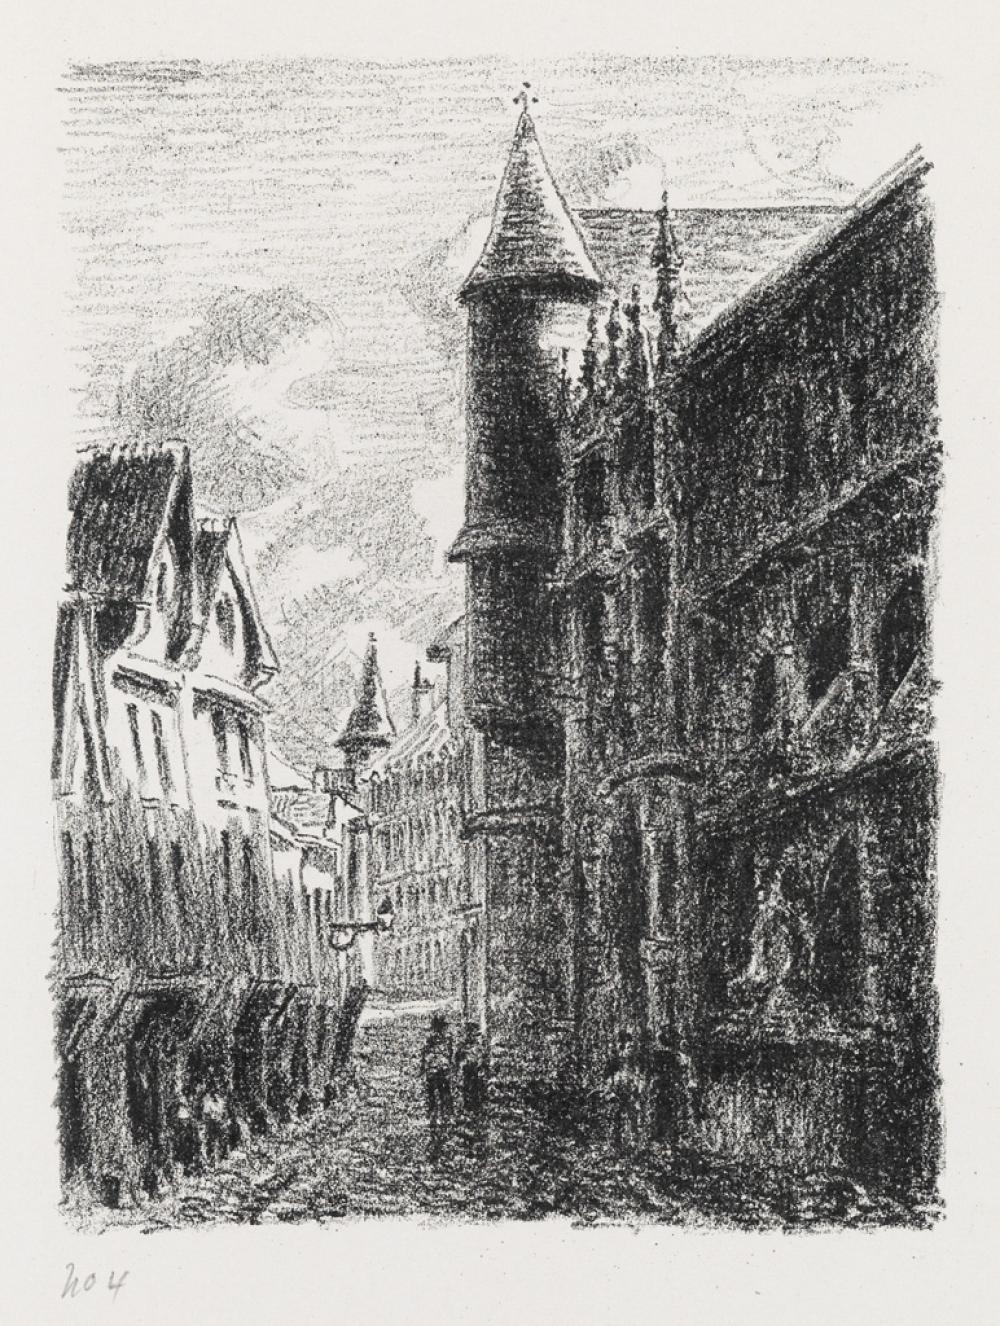 CAMILLE PISSARRO Rue Saint-Romain, à Rouen, 3e planche.